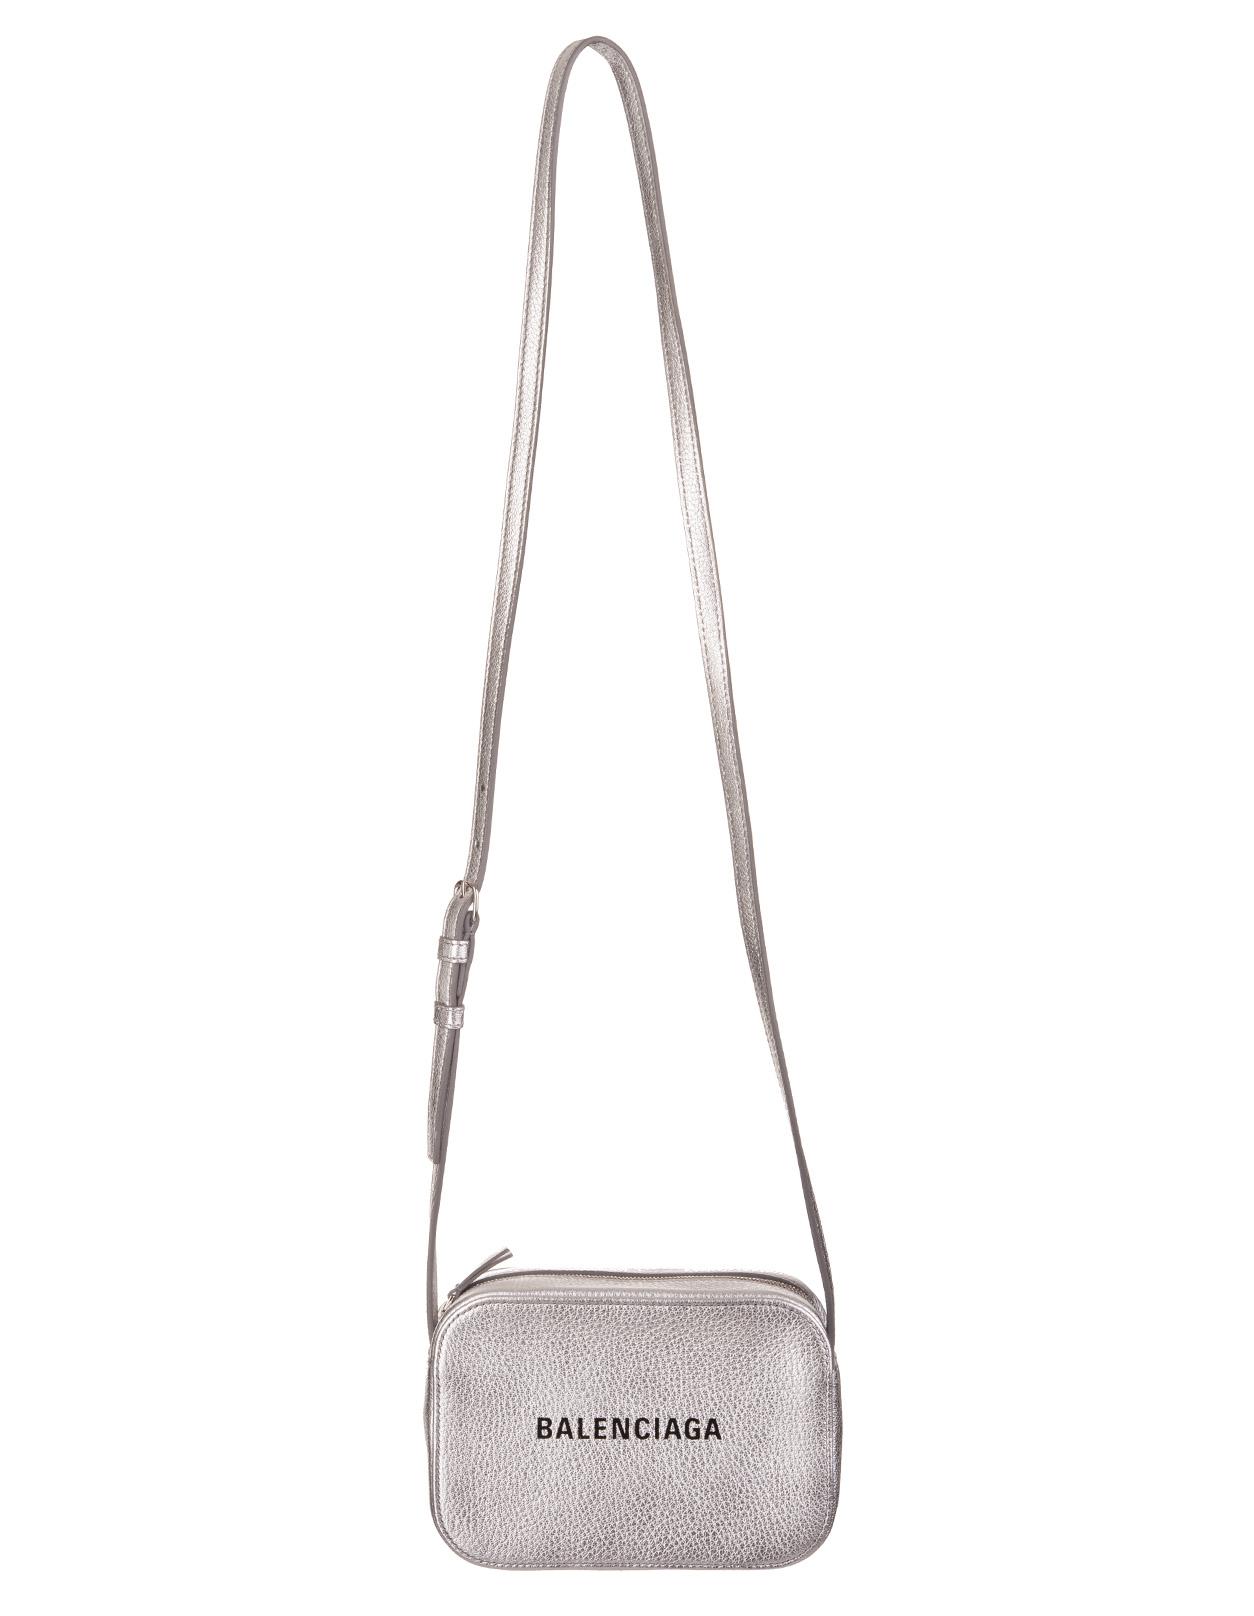 bf4e6b443 Silver Camera Bag - BALENCIAGA - Russocapri